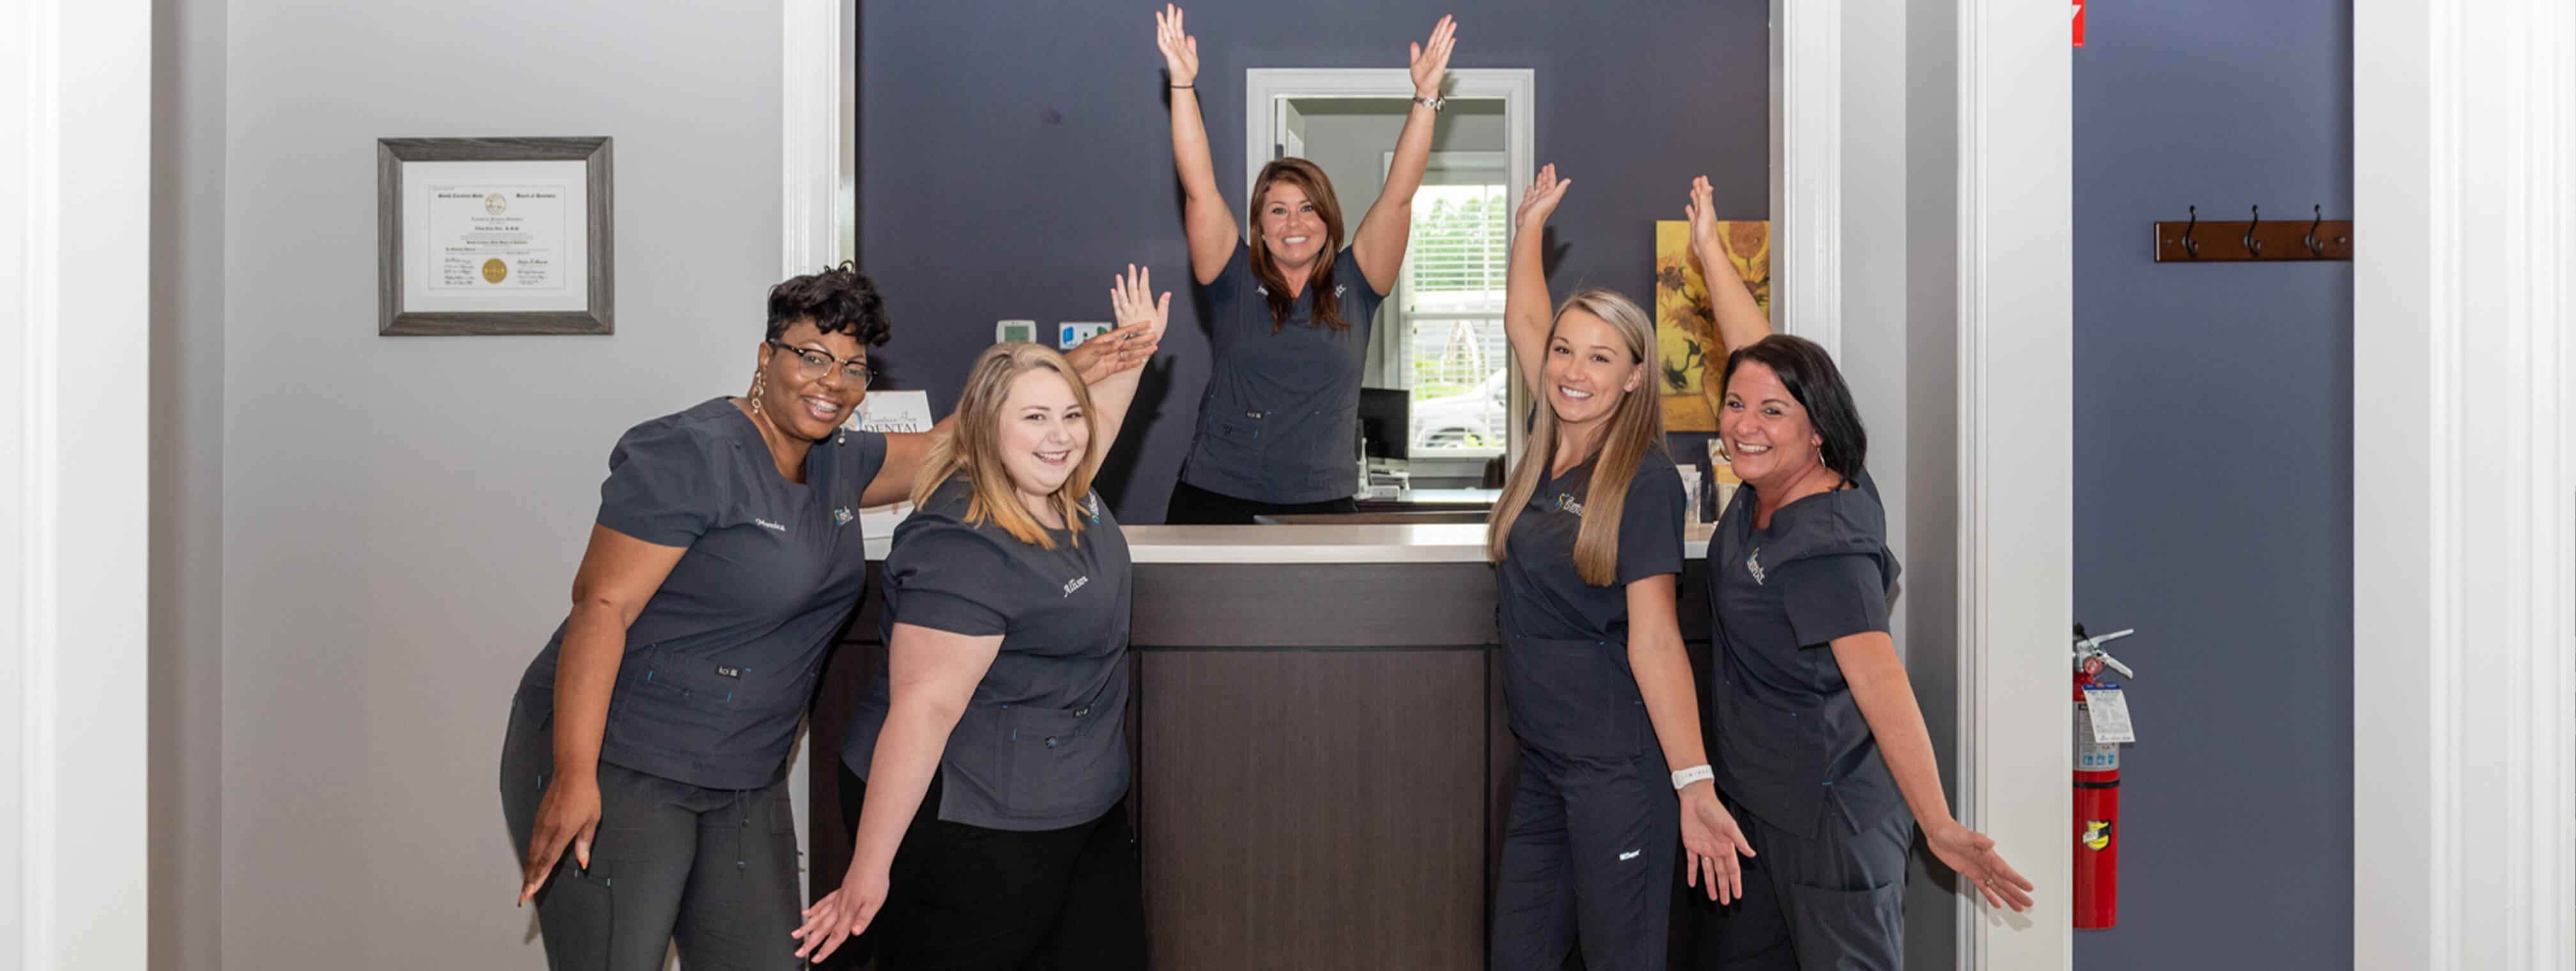 Fountain Inn Dental Office | Fountain Inn, SC 29644 | Cosmetic Dentistry | Sedation Dentistry